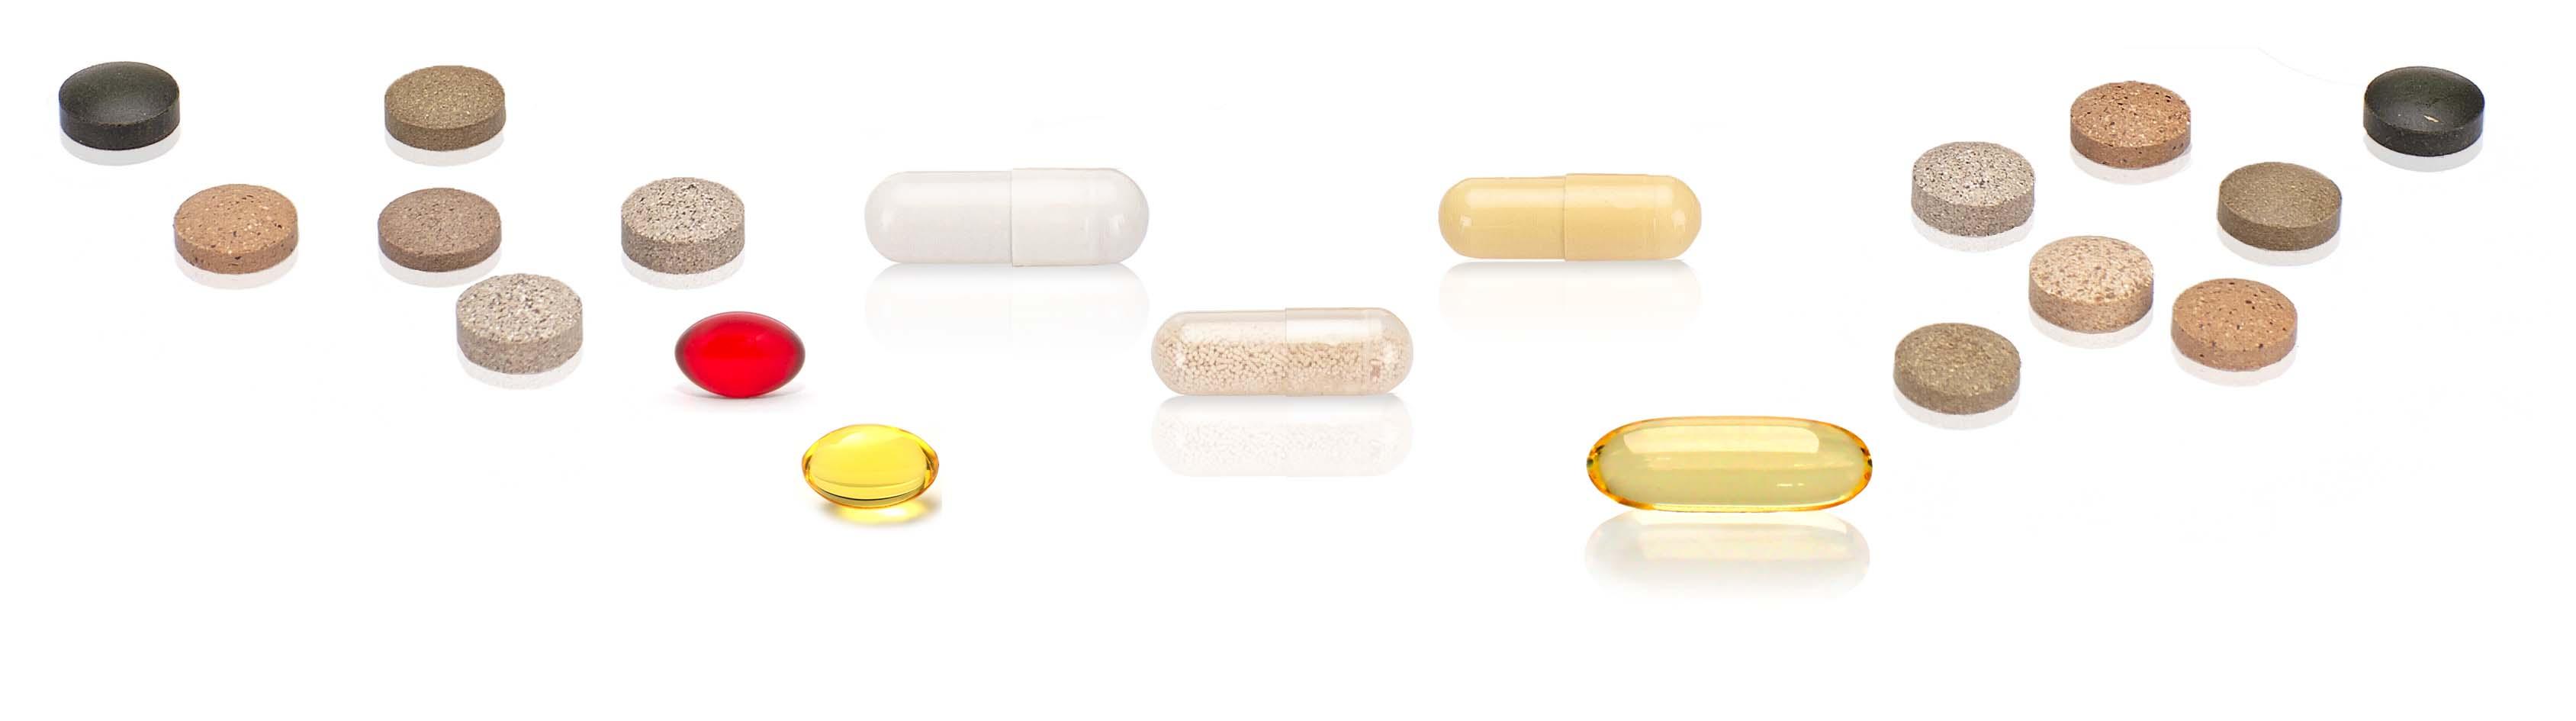 robis-formatos-capsulas-comprimidos-1